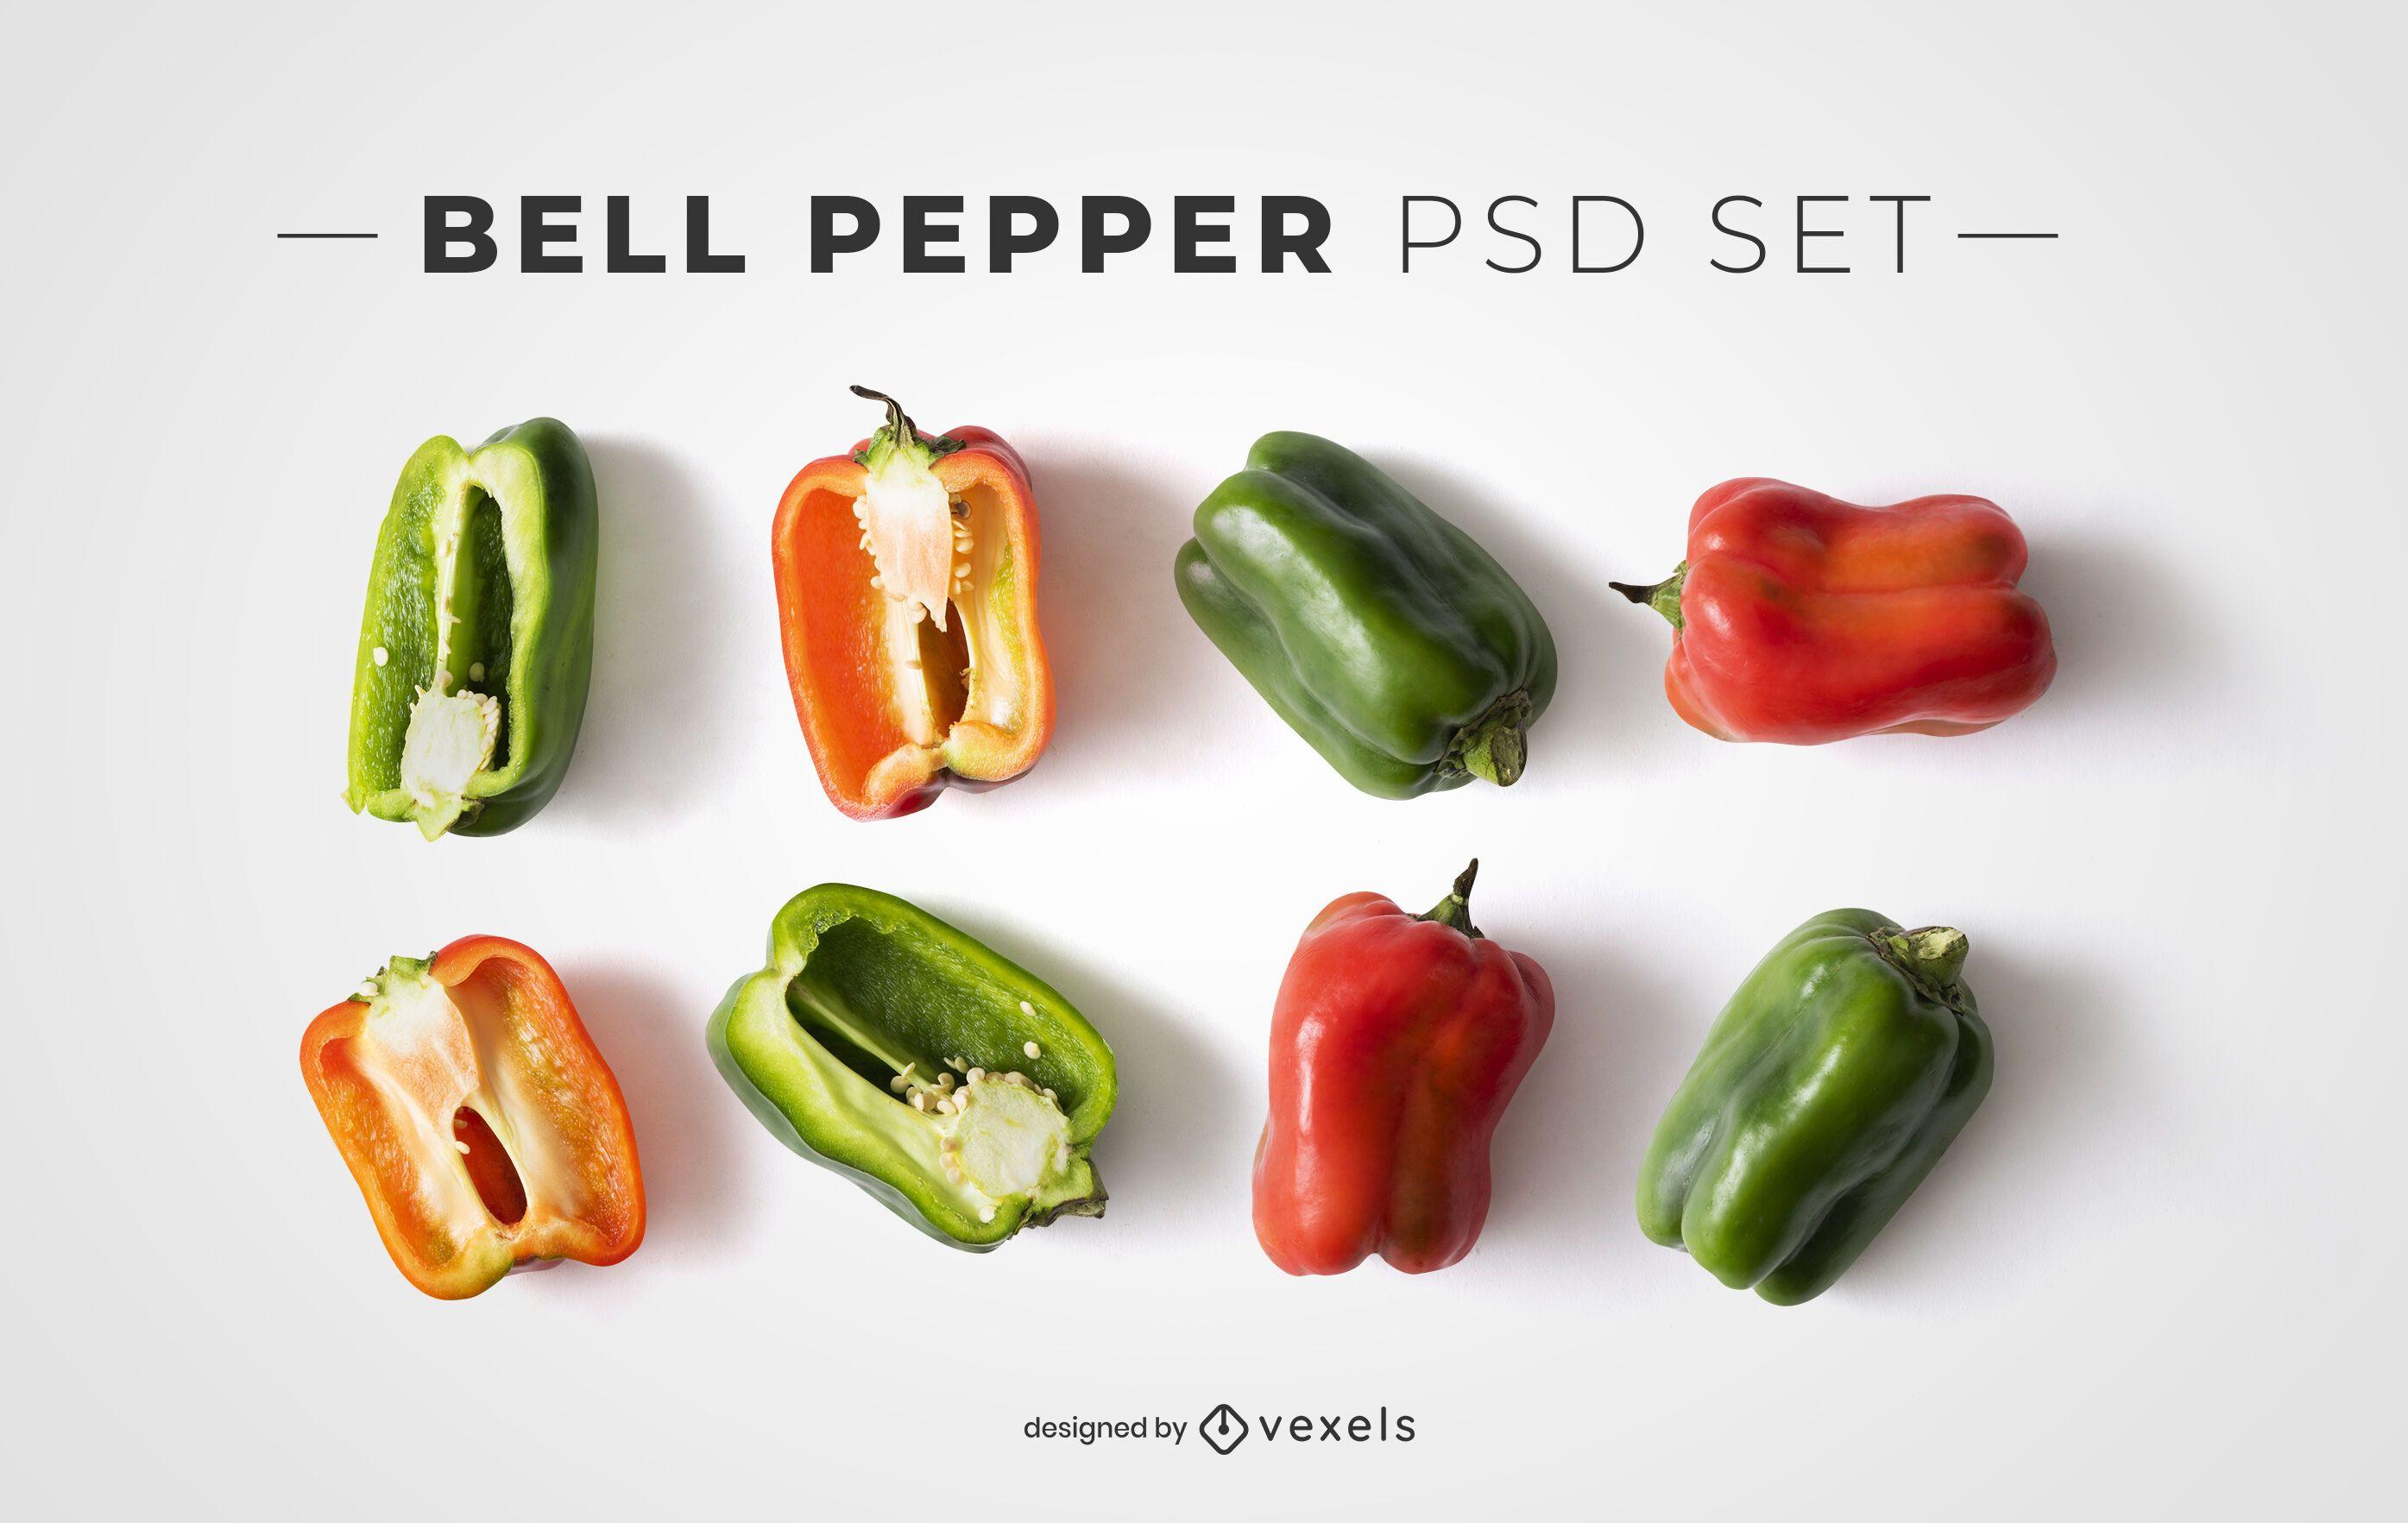 Bell pepper psd elements for mockups